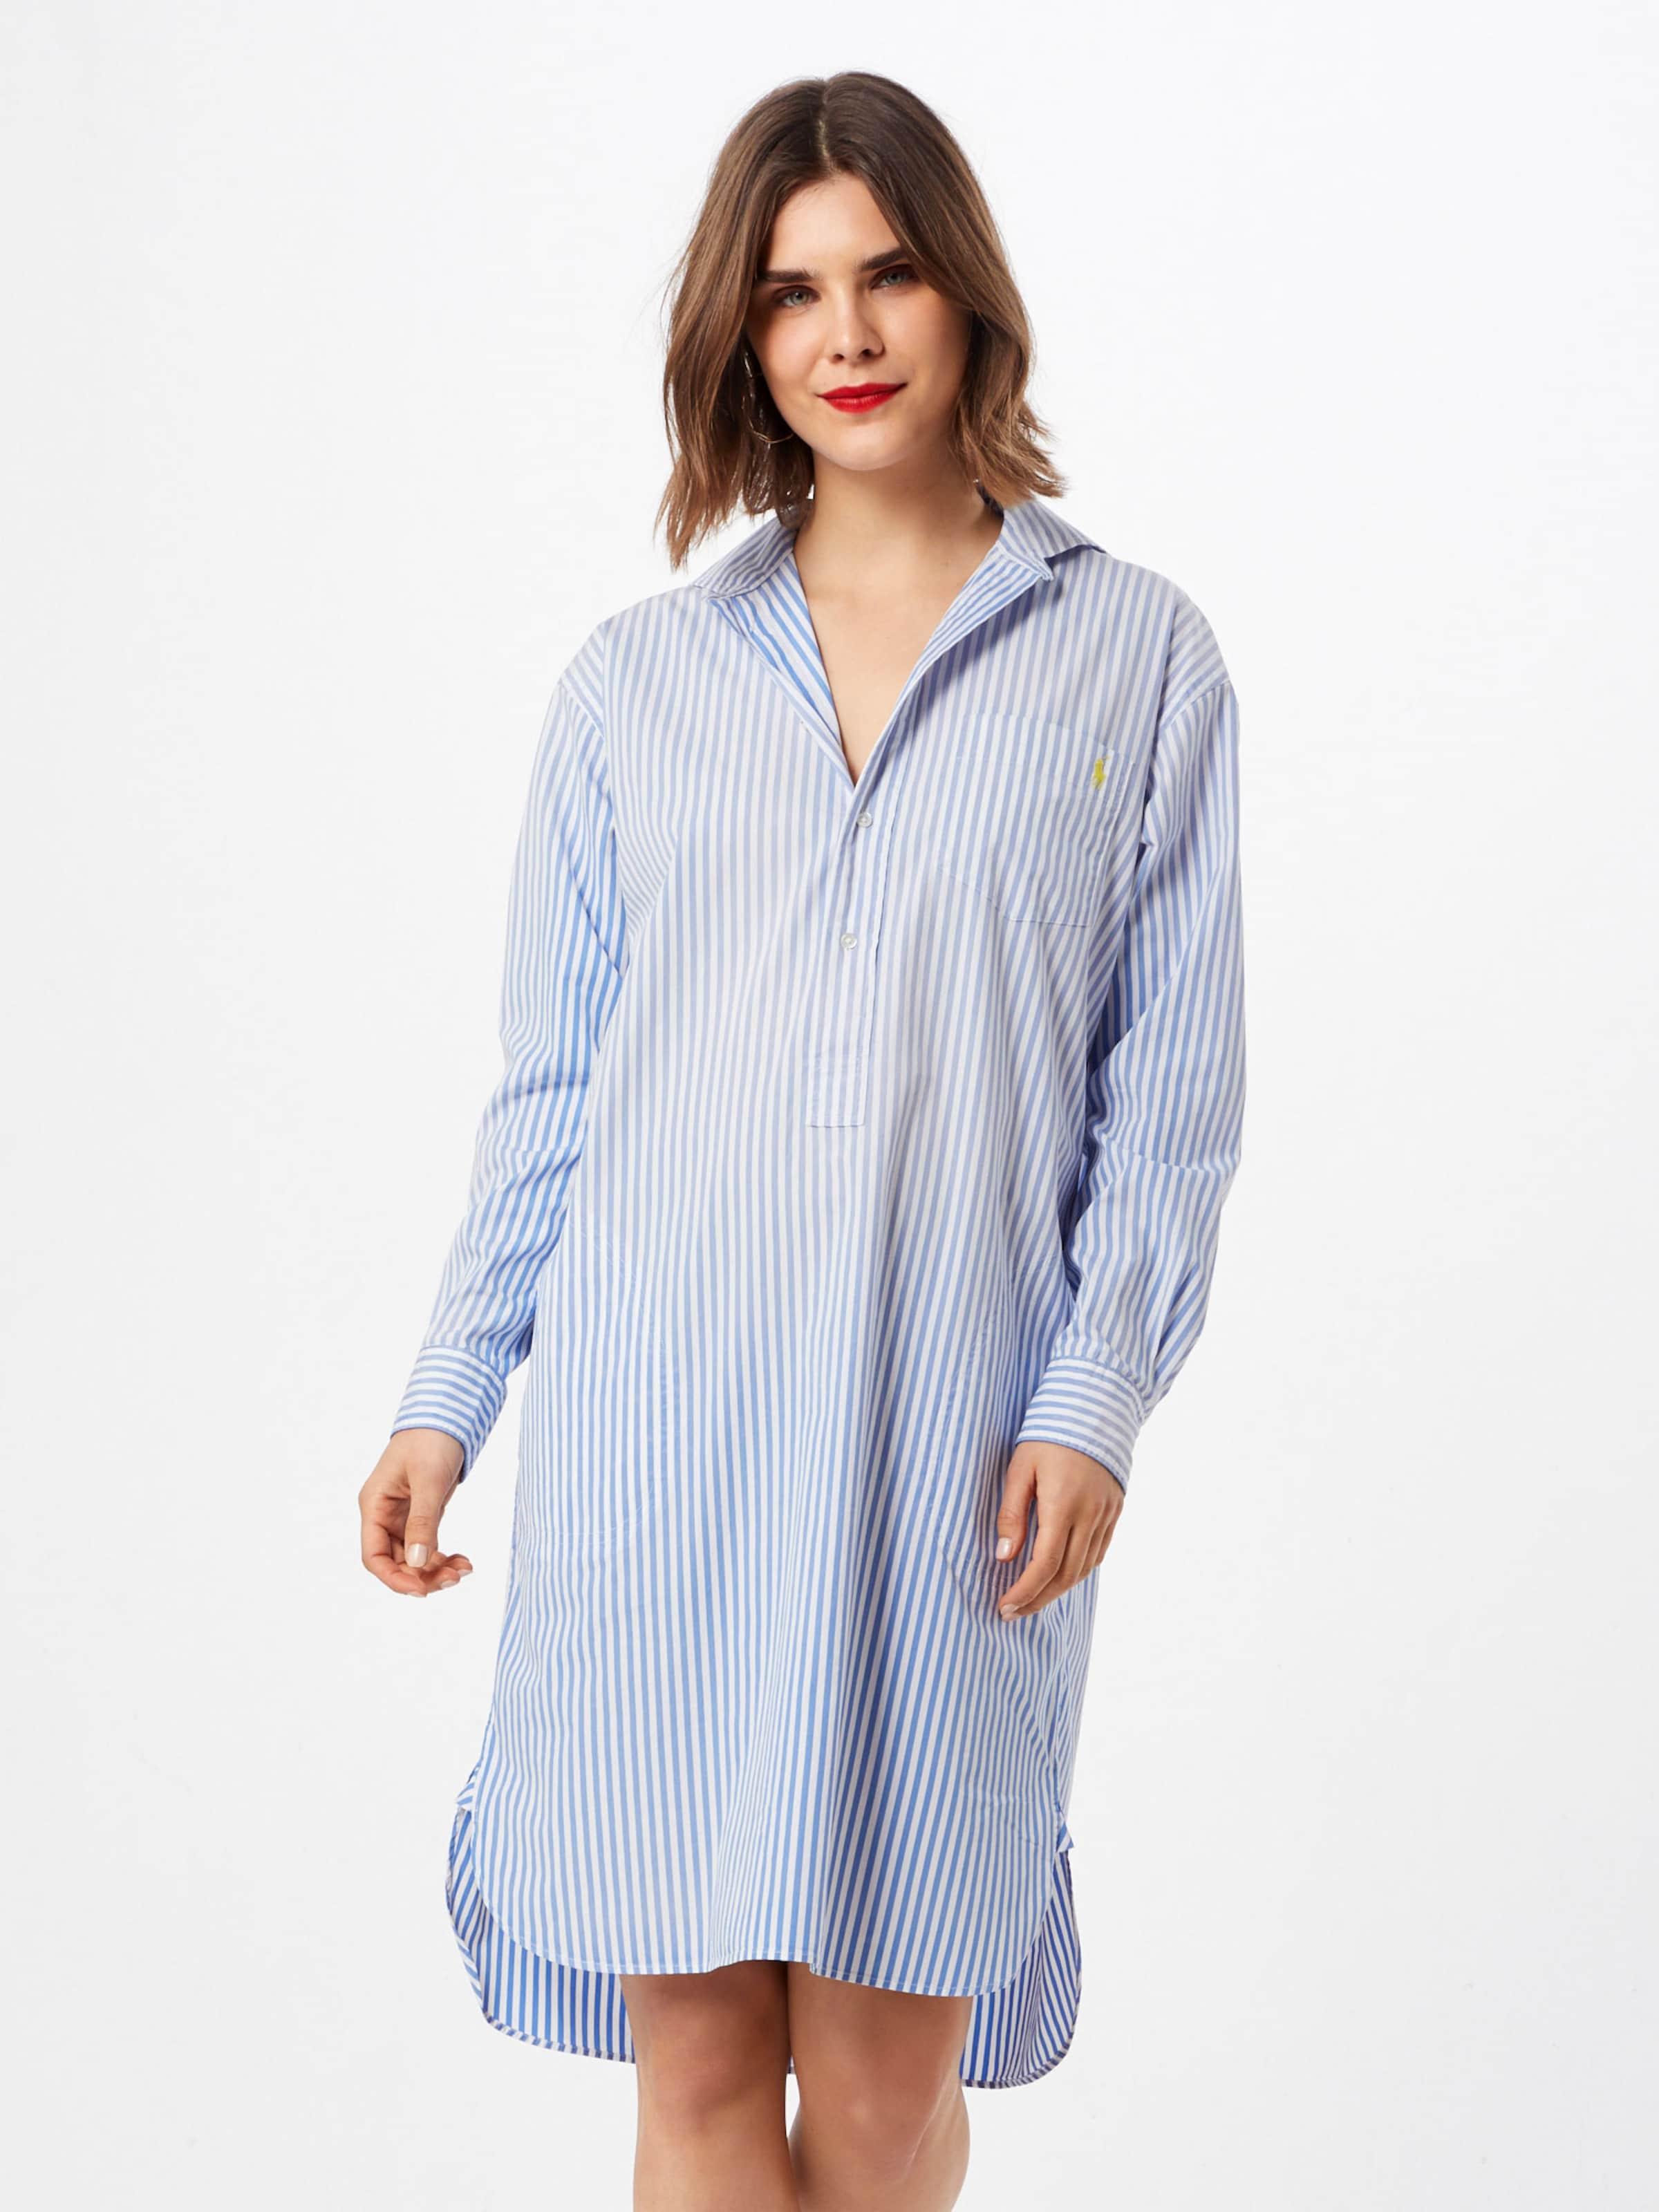 chemise En Robe BleuBlanc Polo Ralph Lauren OwiTklPXZu